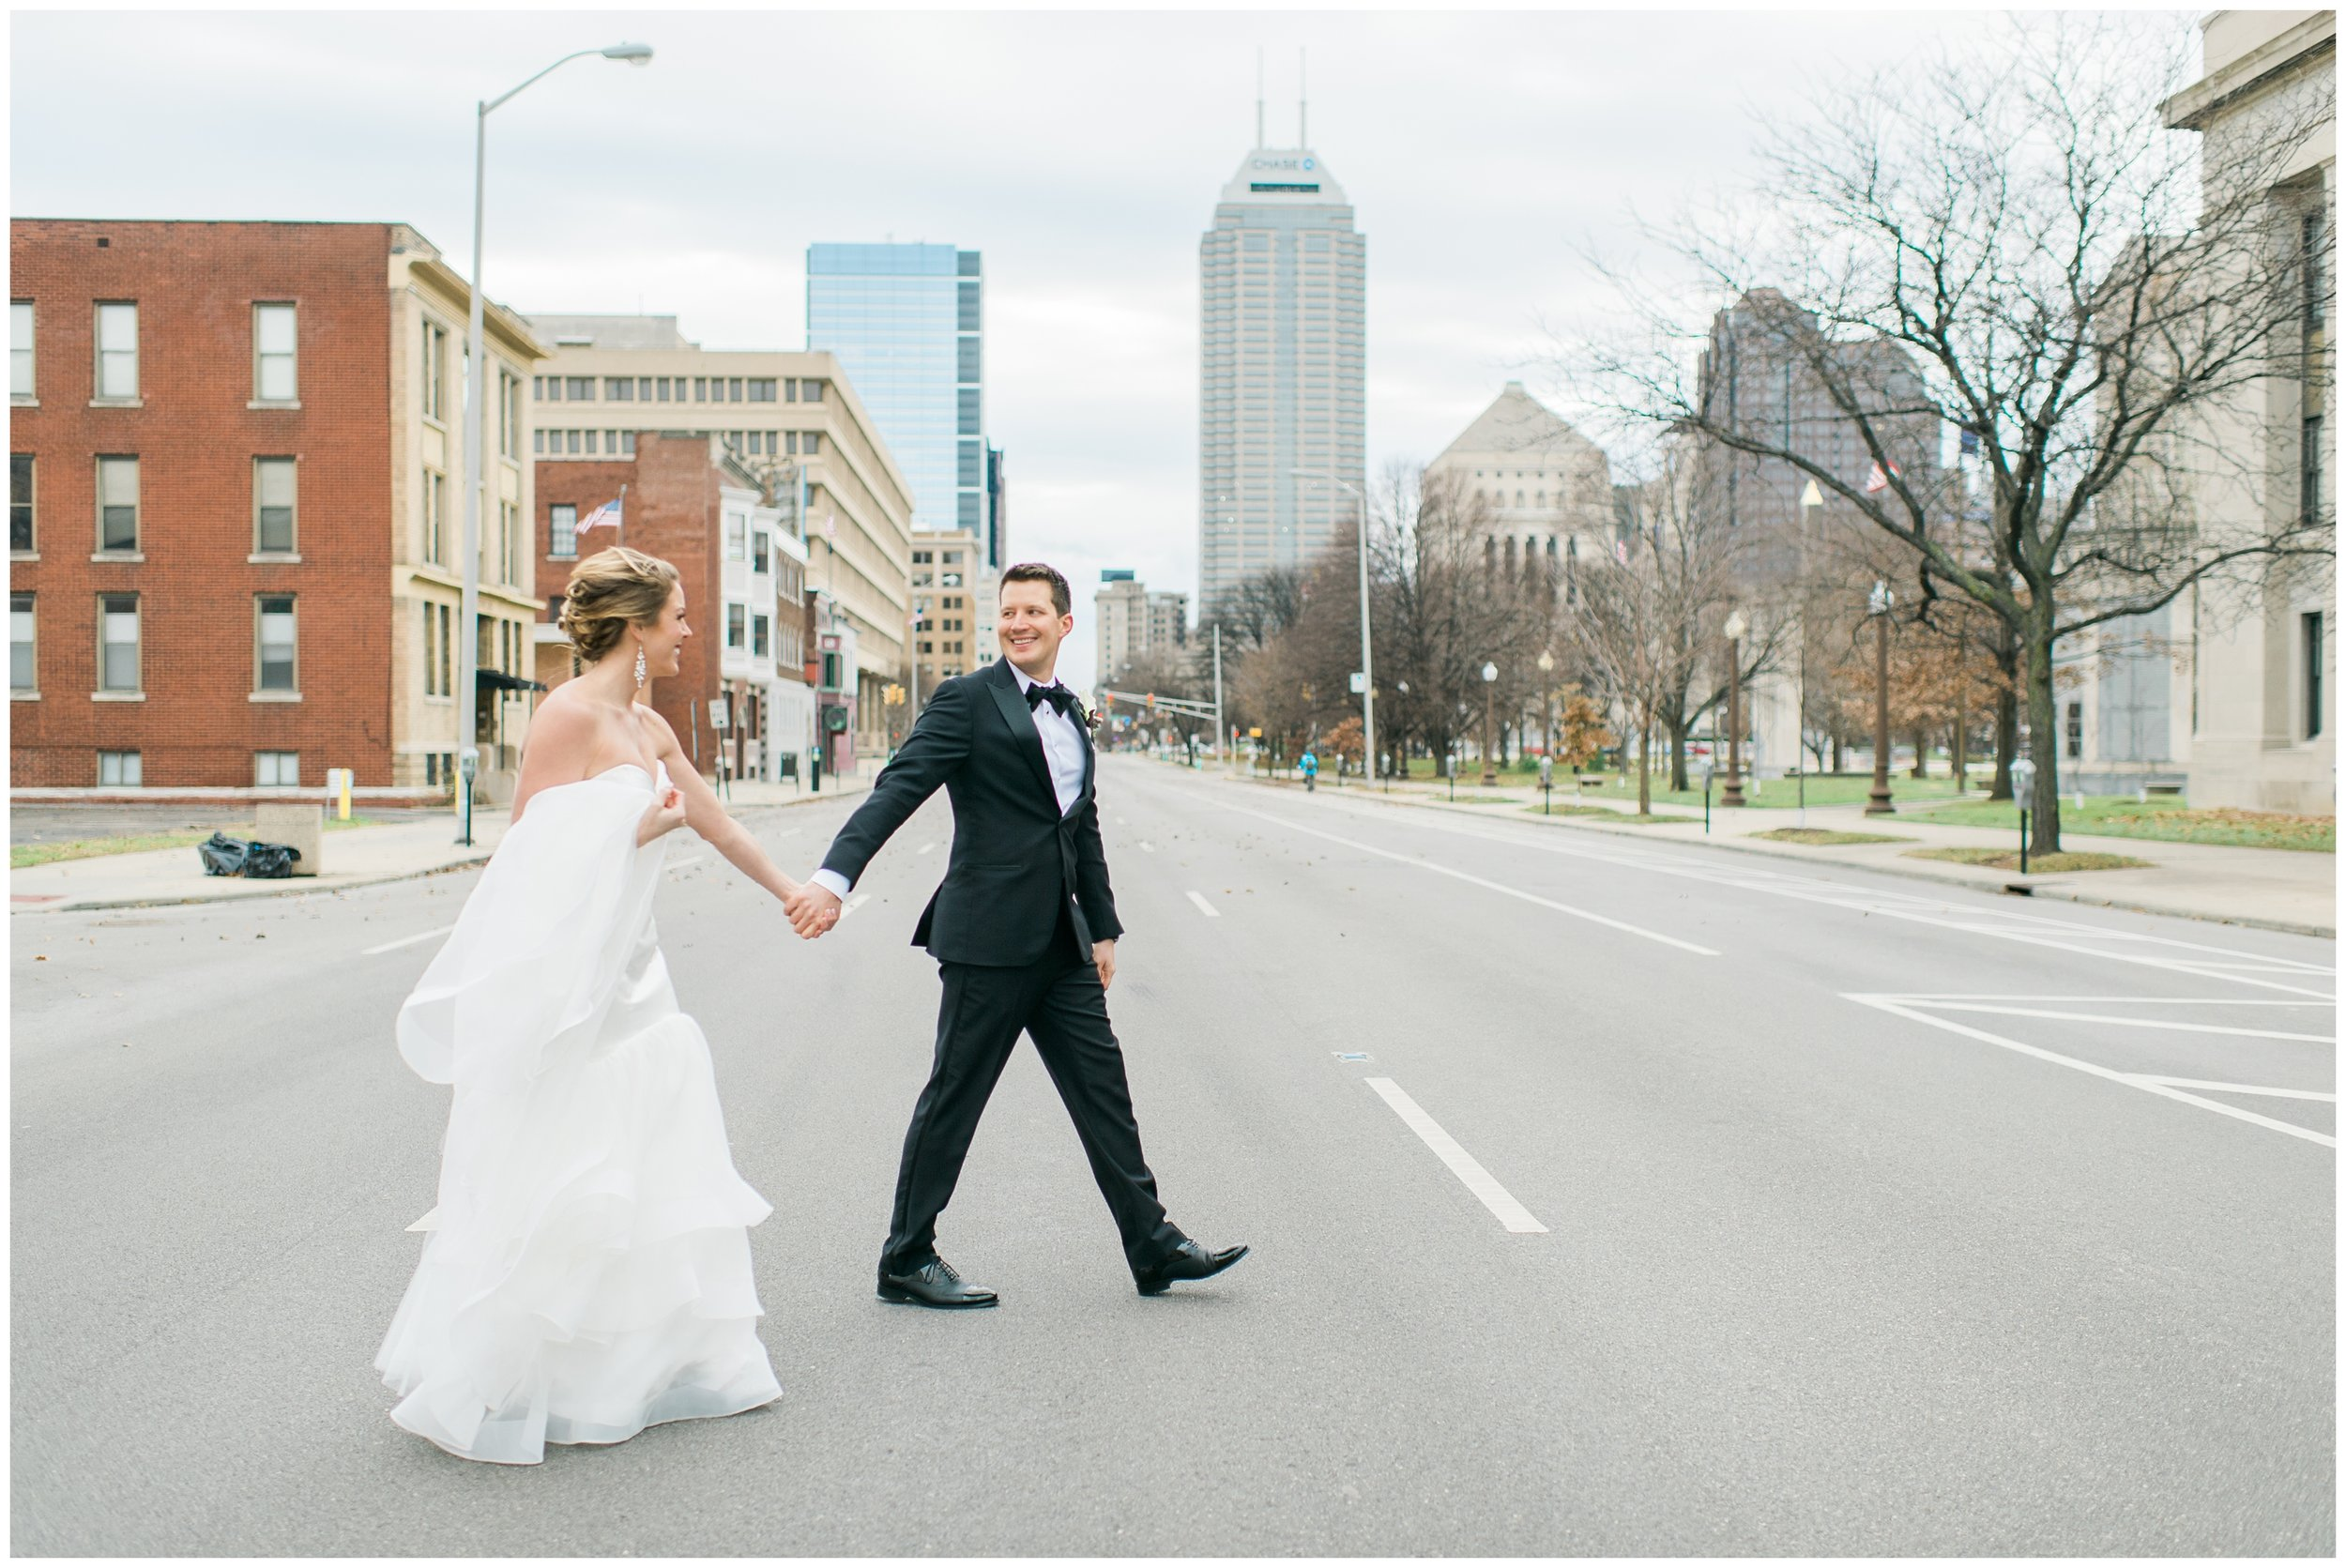 Rebecca_Bridges_Photography_Indianapolis_Wedding_Photographer_5803.jpg